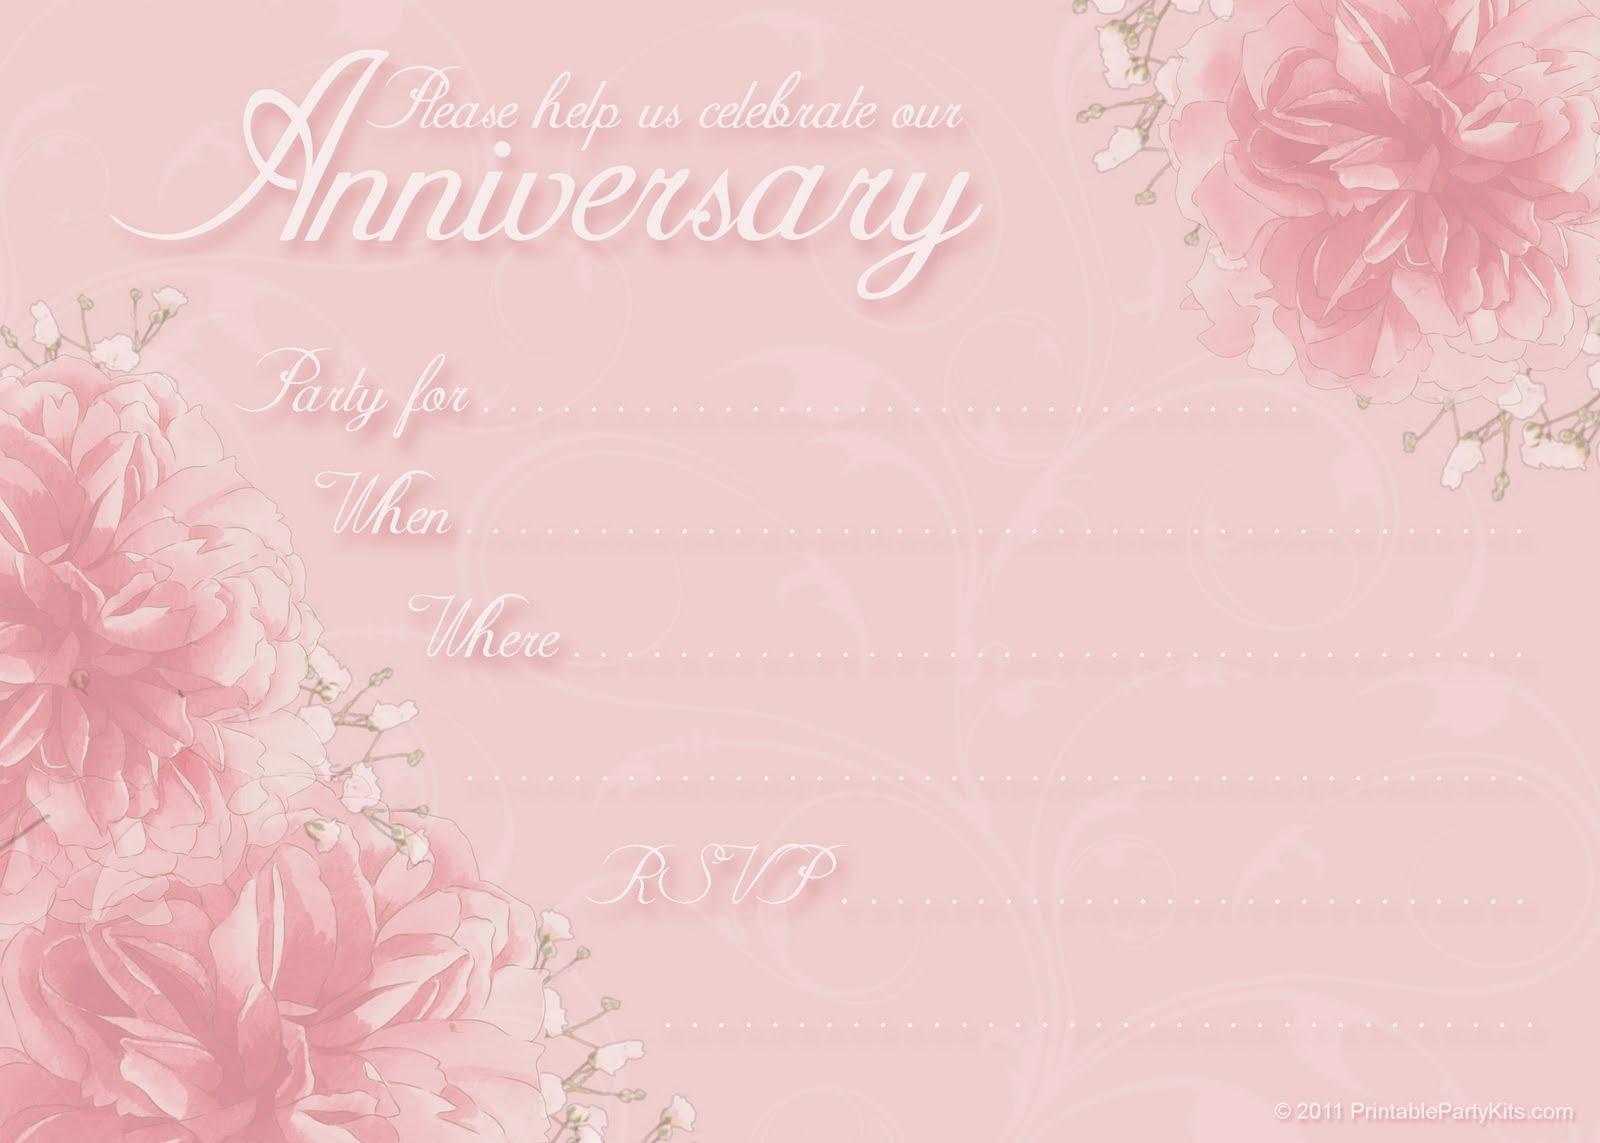 templates for anniversary invitations koni polycode co